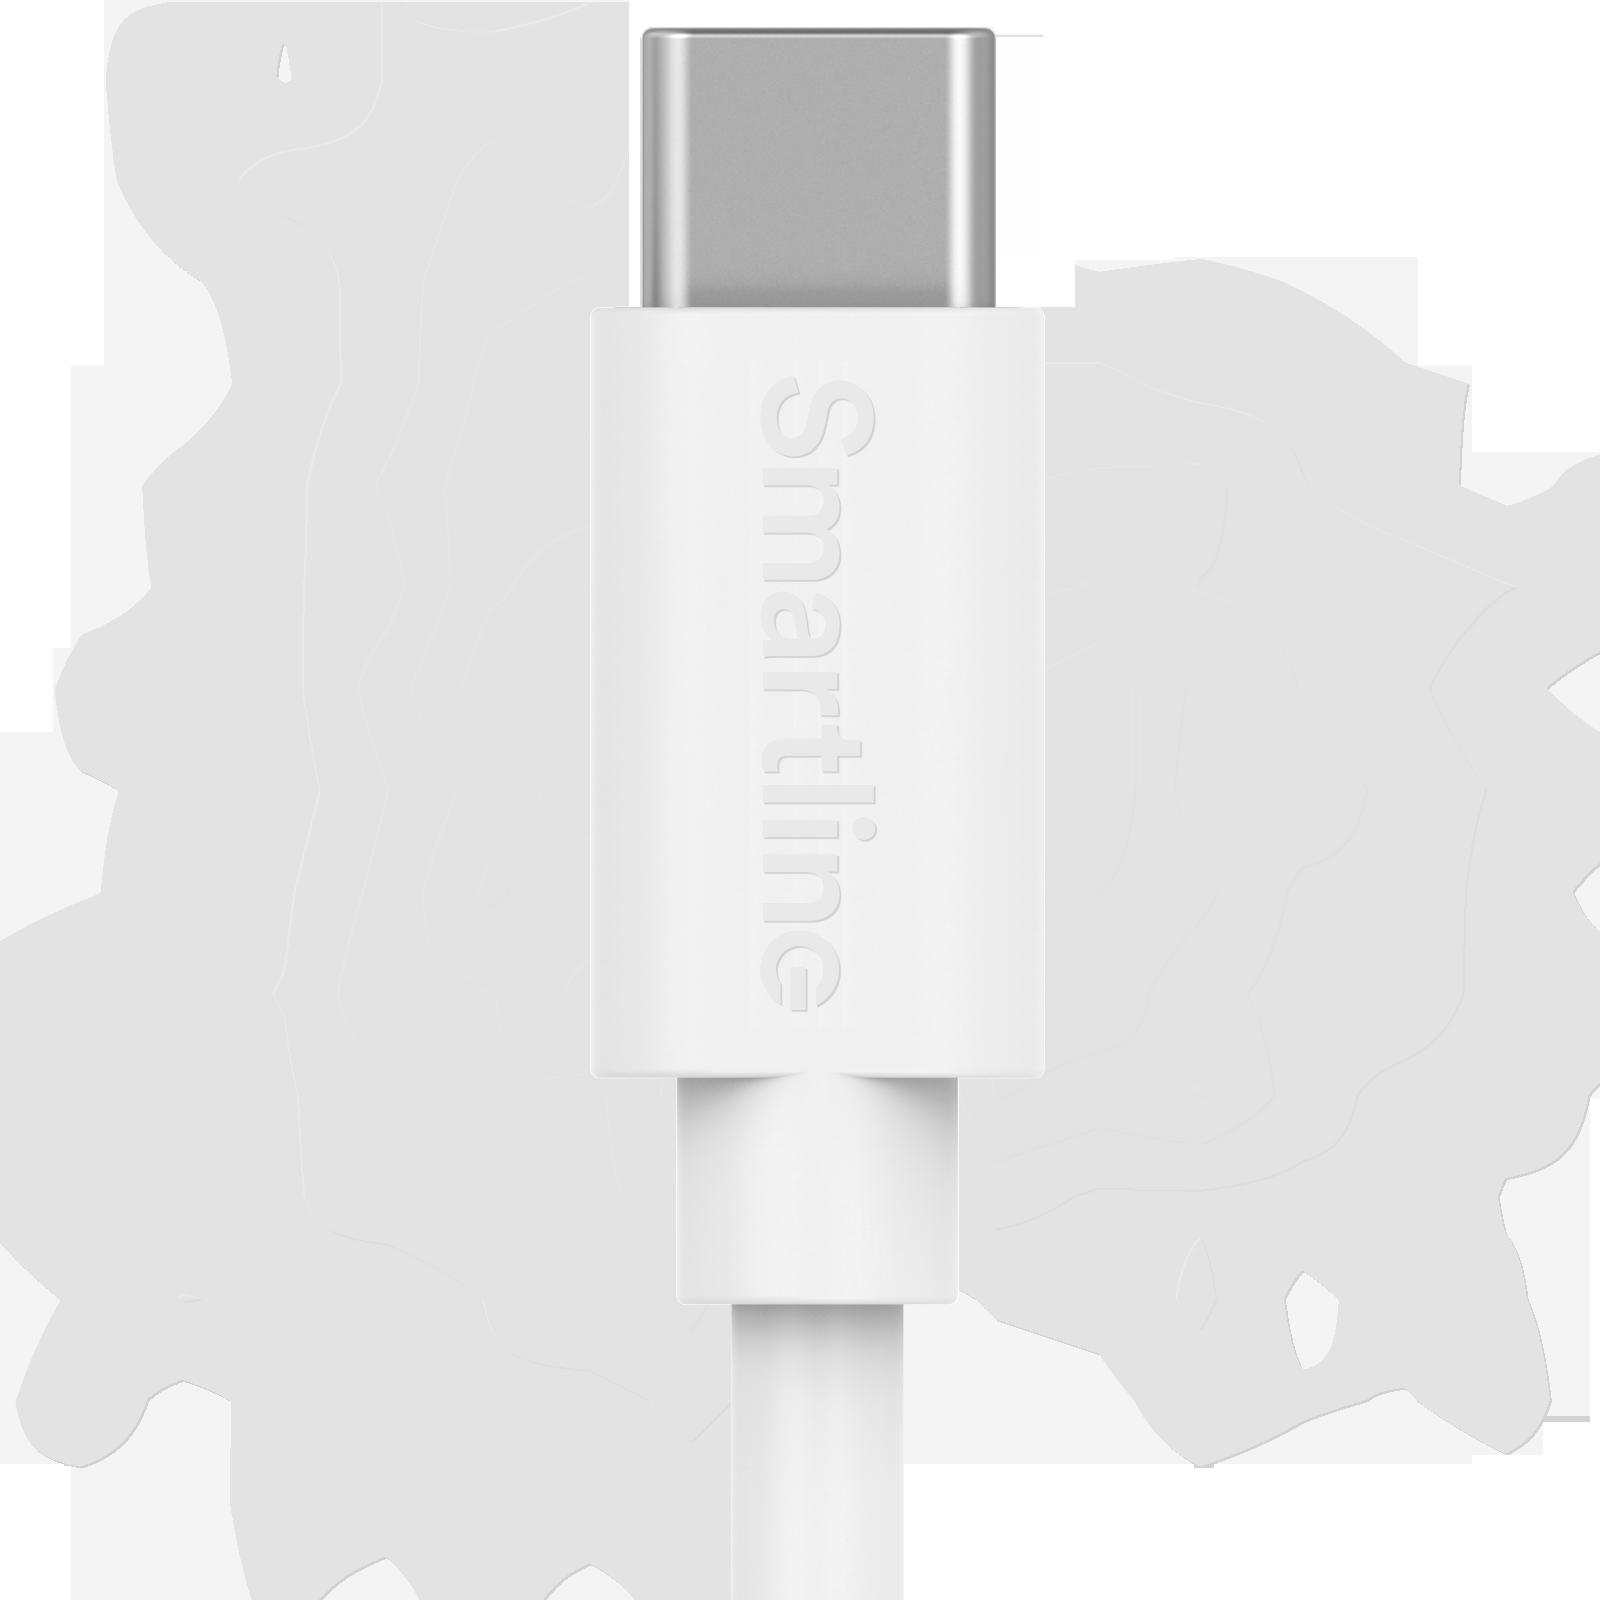 USB-kabel USB-C 1m Vit